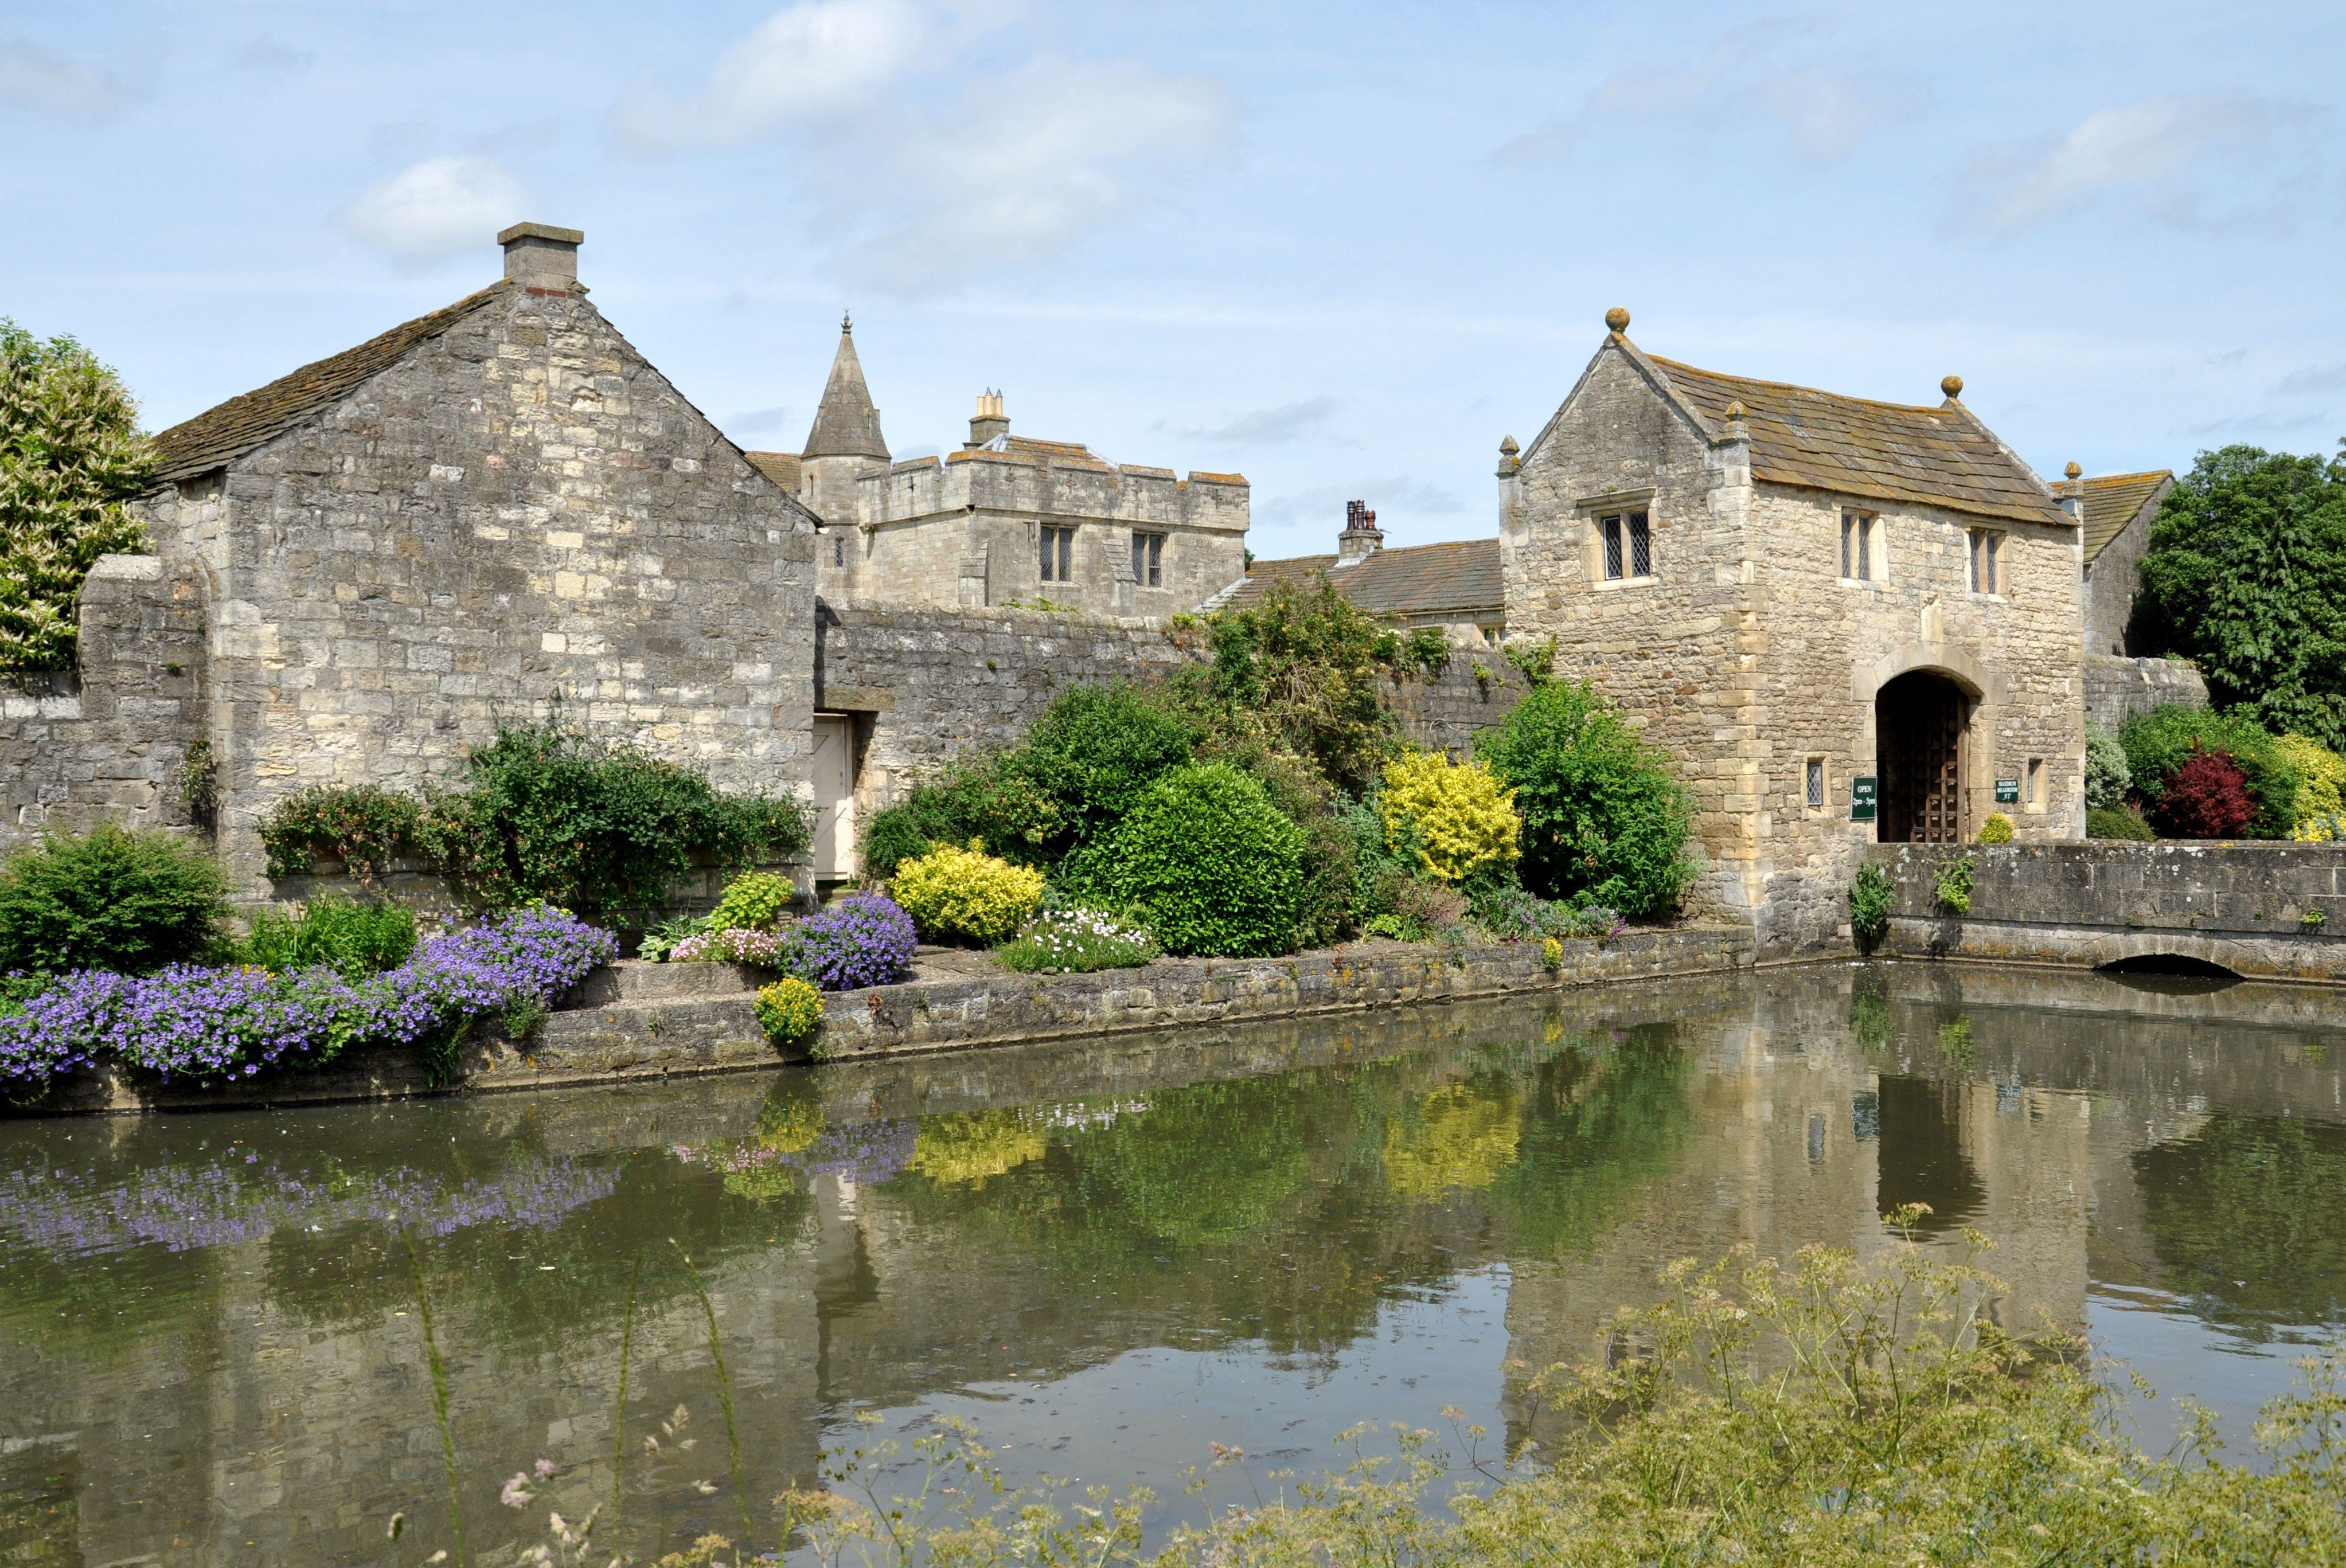 Markenfield Hall near Ripon a 14th century moated farm house